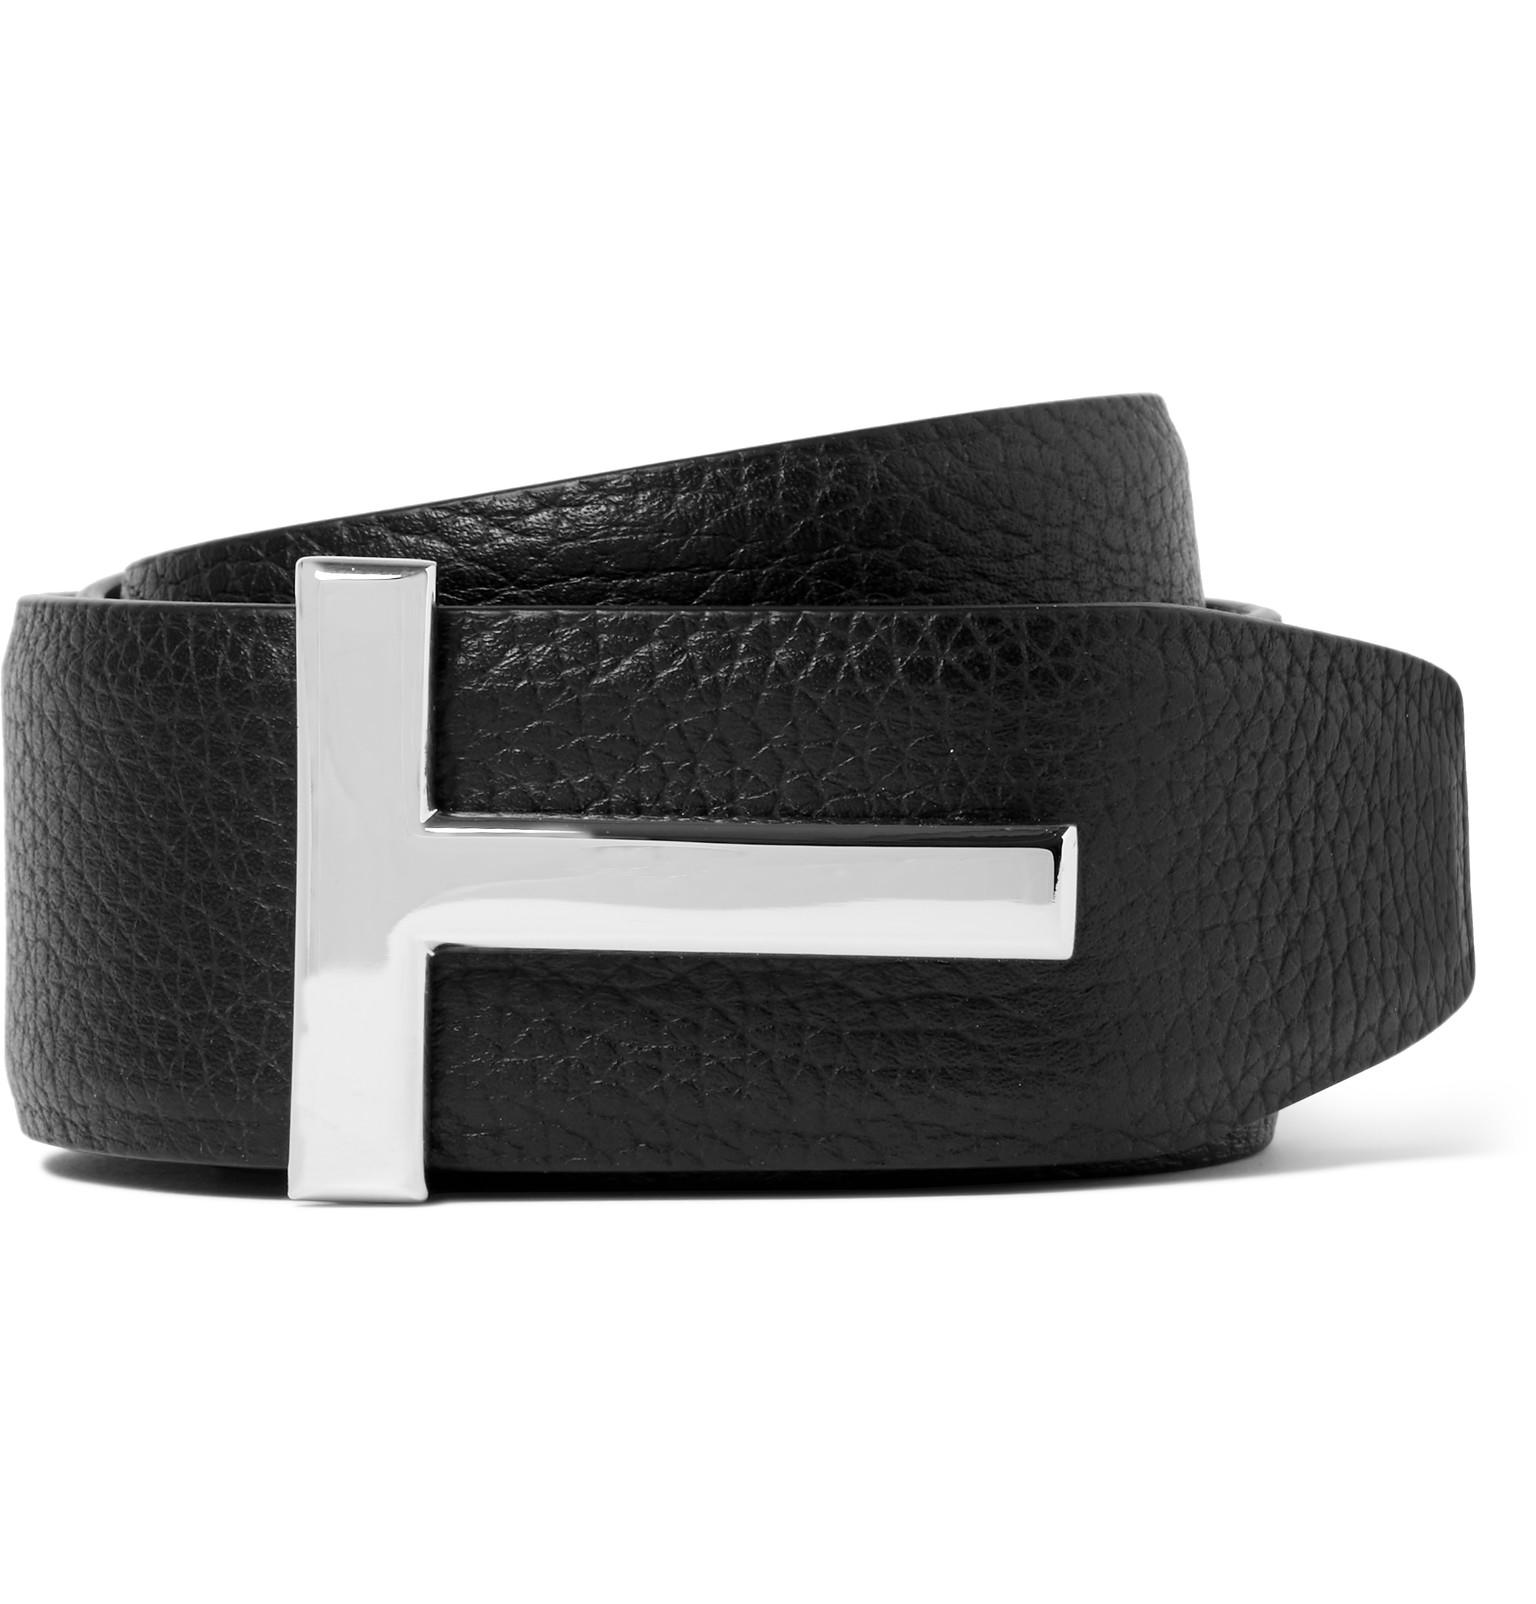 ca7de98f7 Tom Ford Tom Ford Black T Icon Belt | Grailed